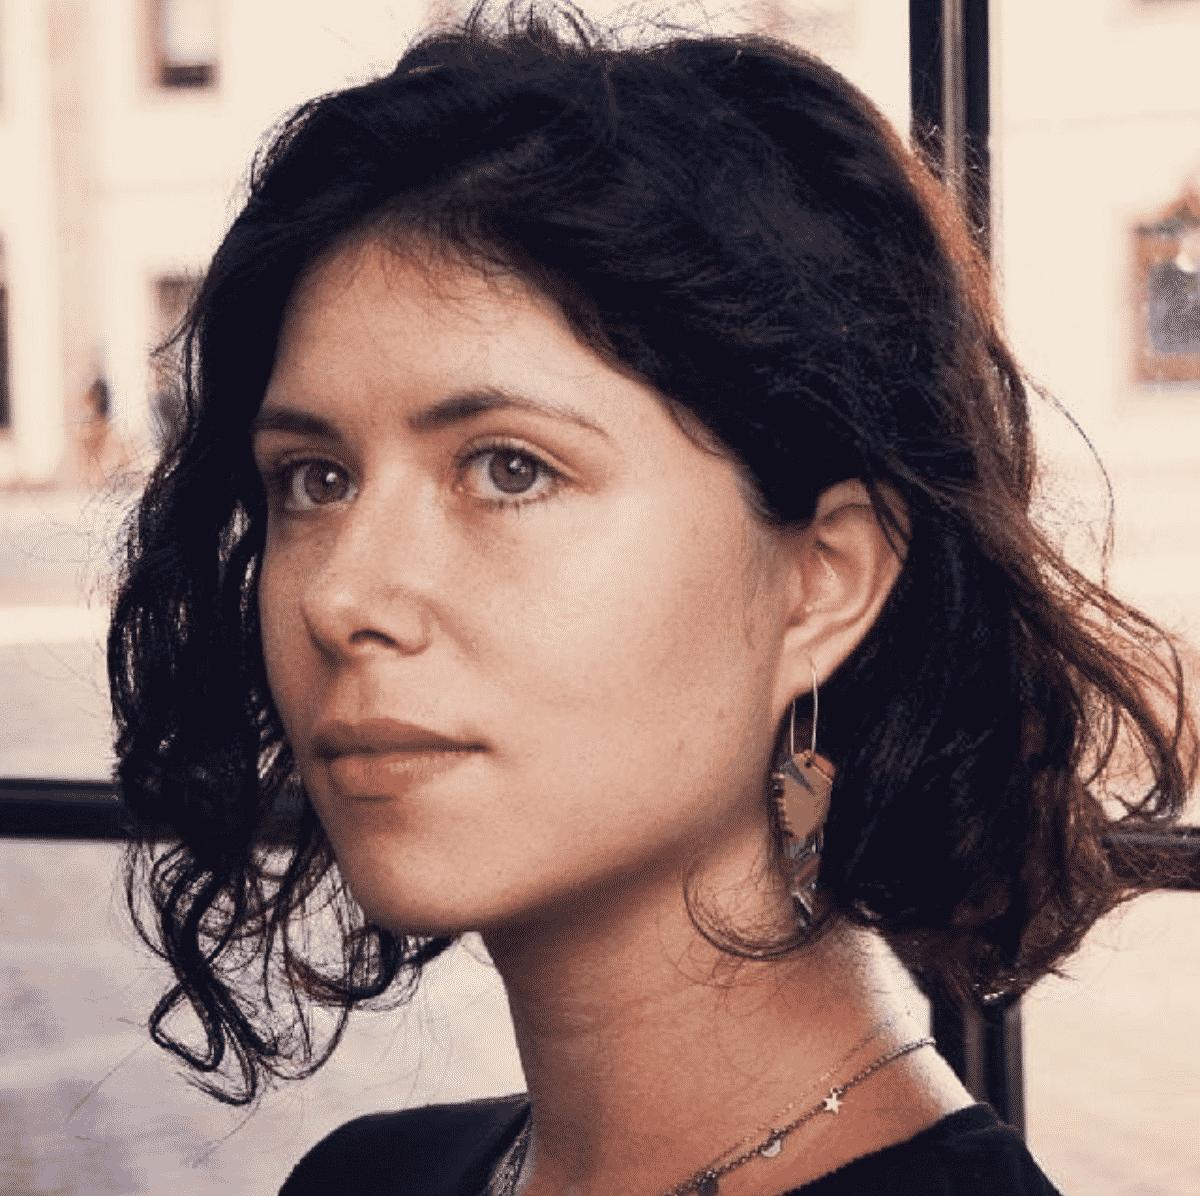 Nerea Gomez Diseñadora Gráfica e Ilustradora